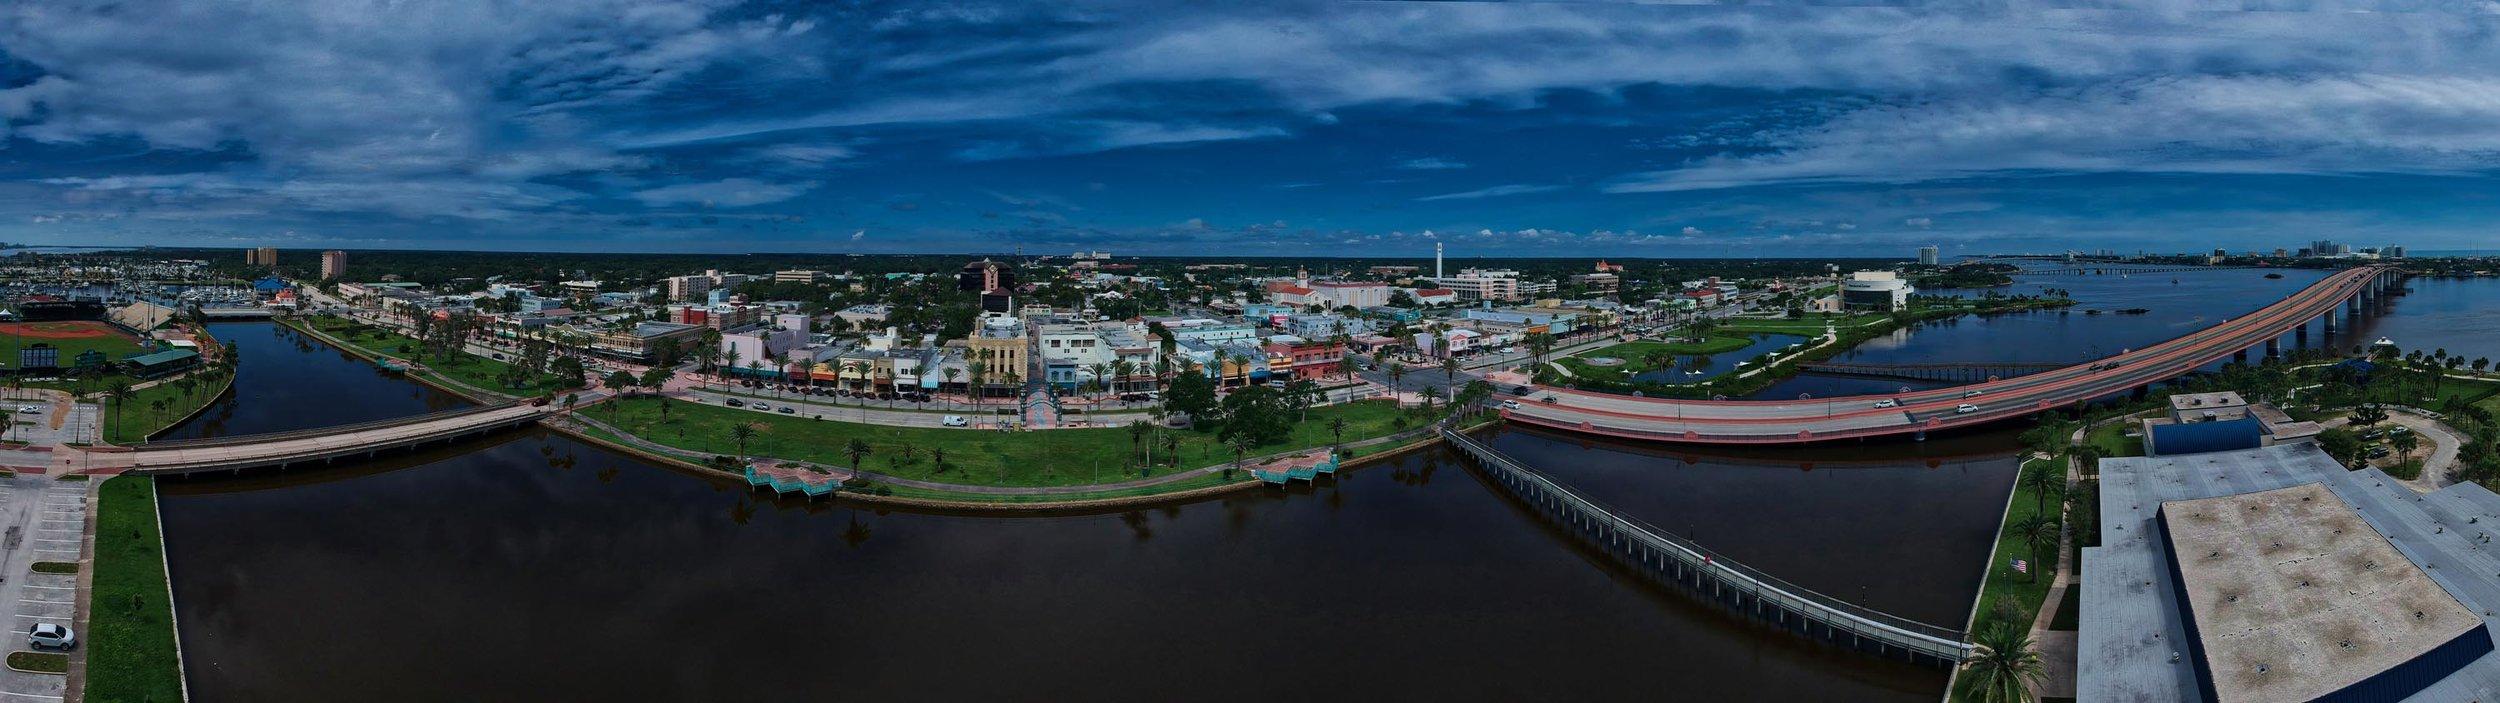 city island_Panorama1.jpg